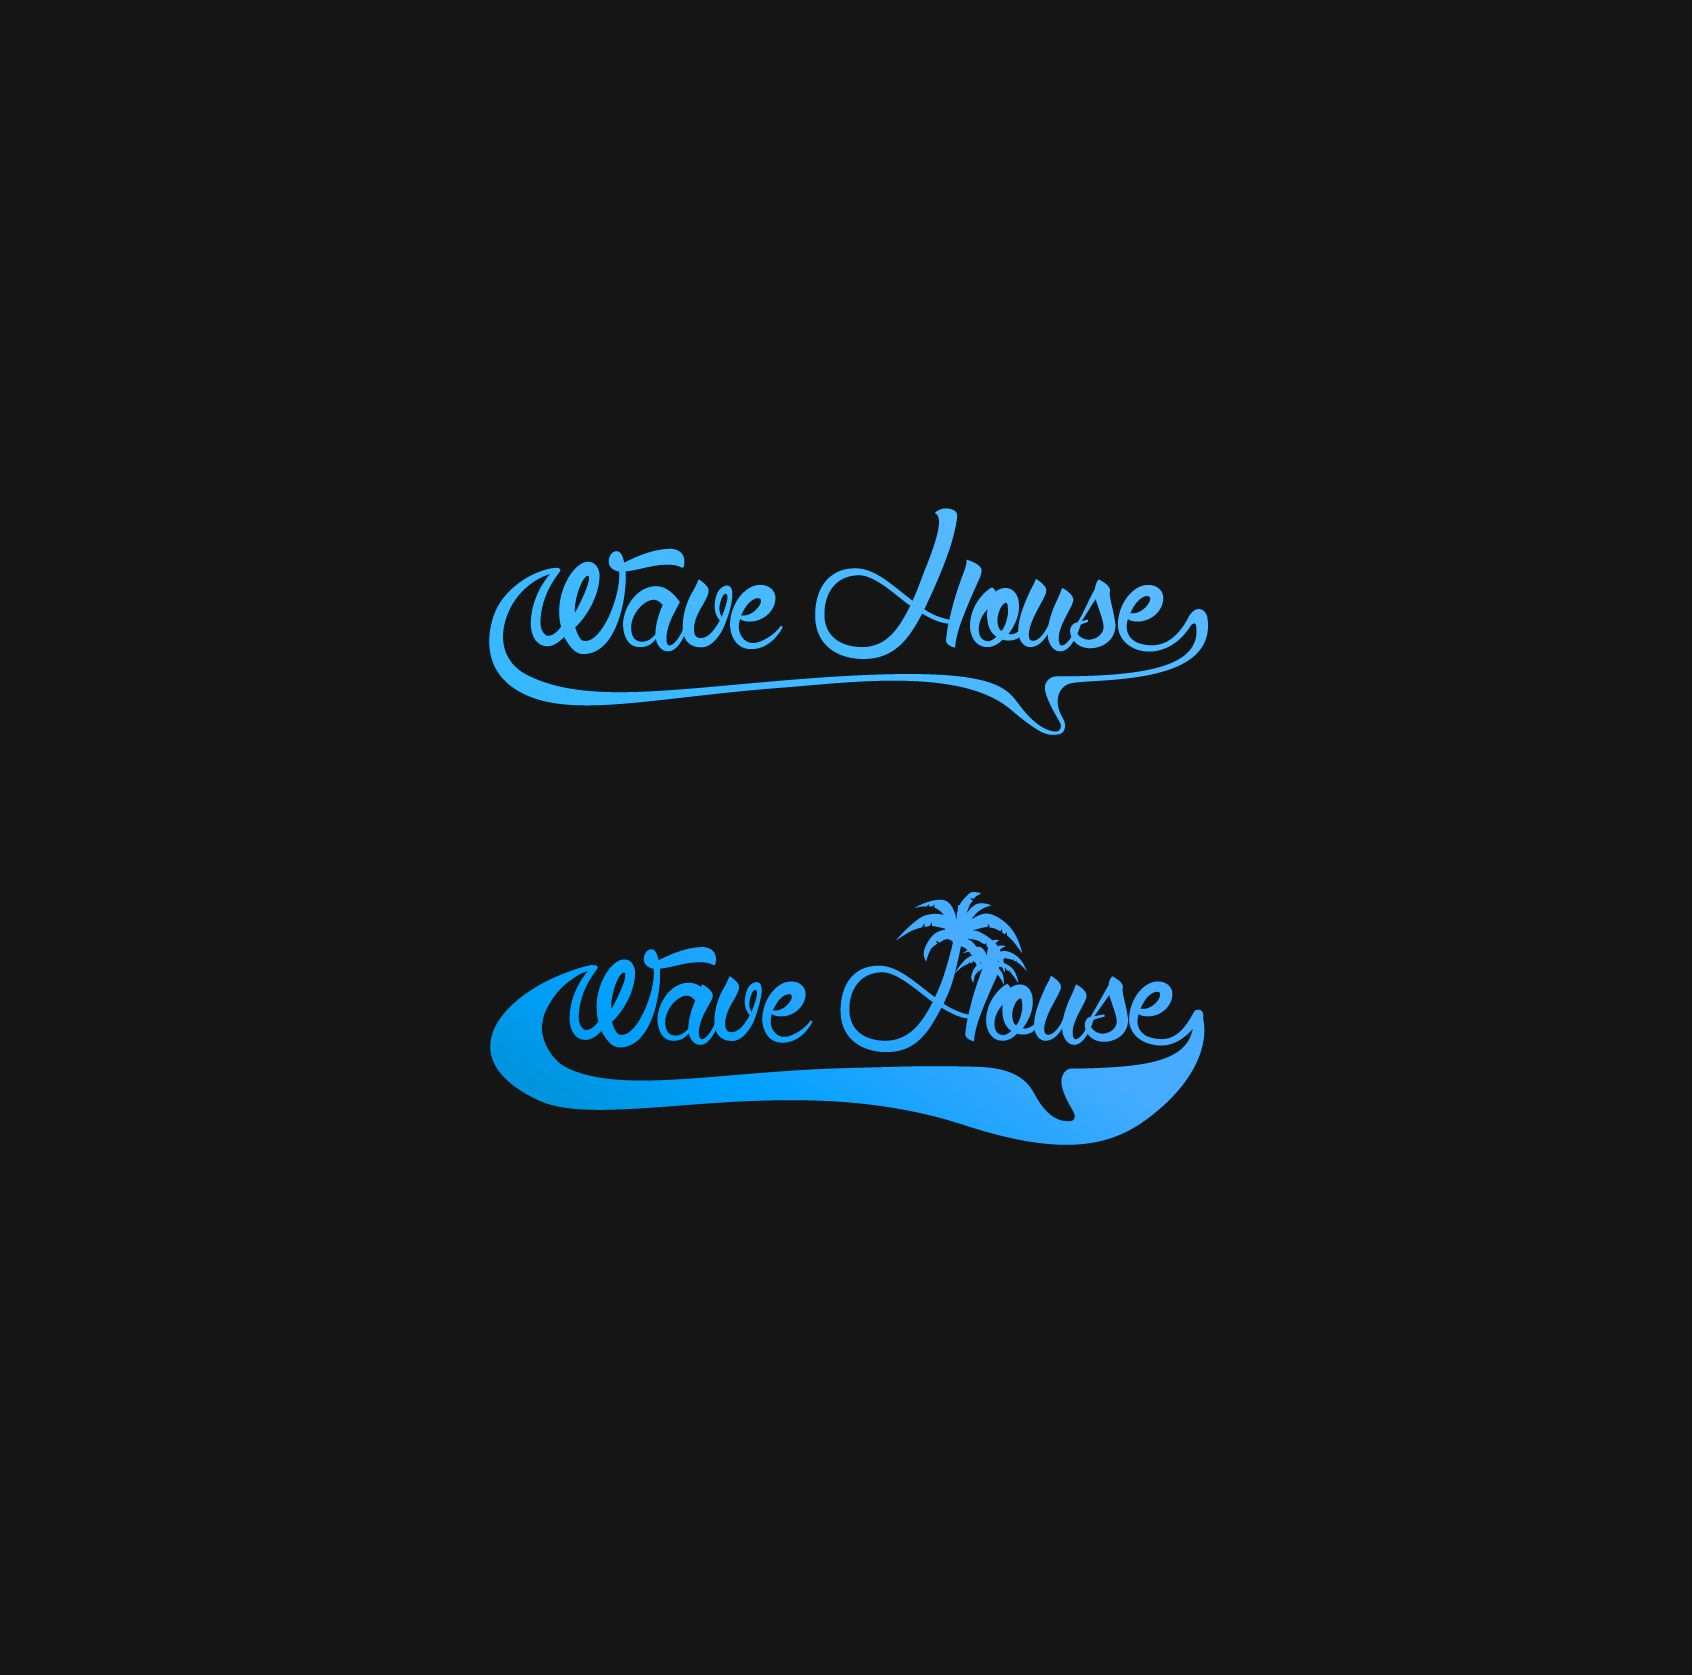 Редизайн логотипа для серф-кэмпа на Бали - дизайнер silapov